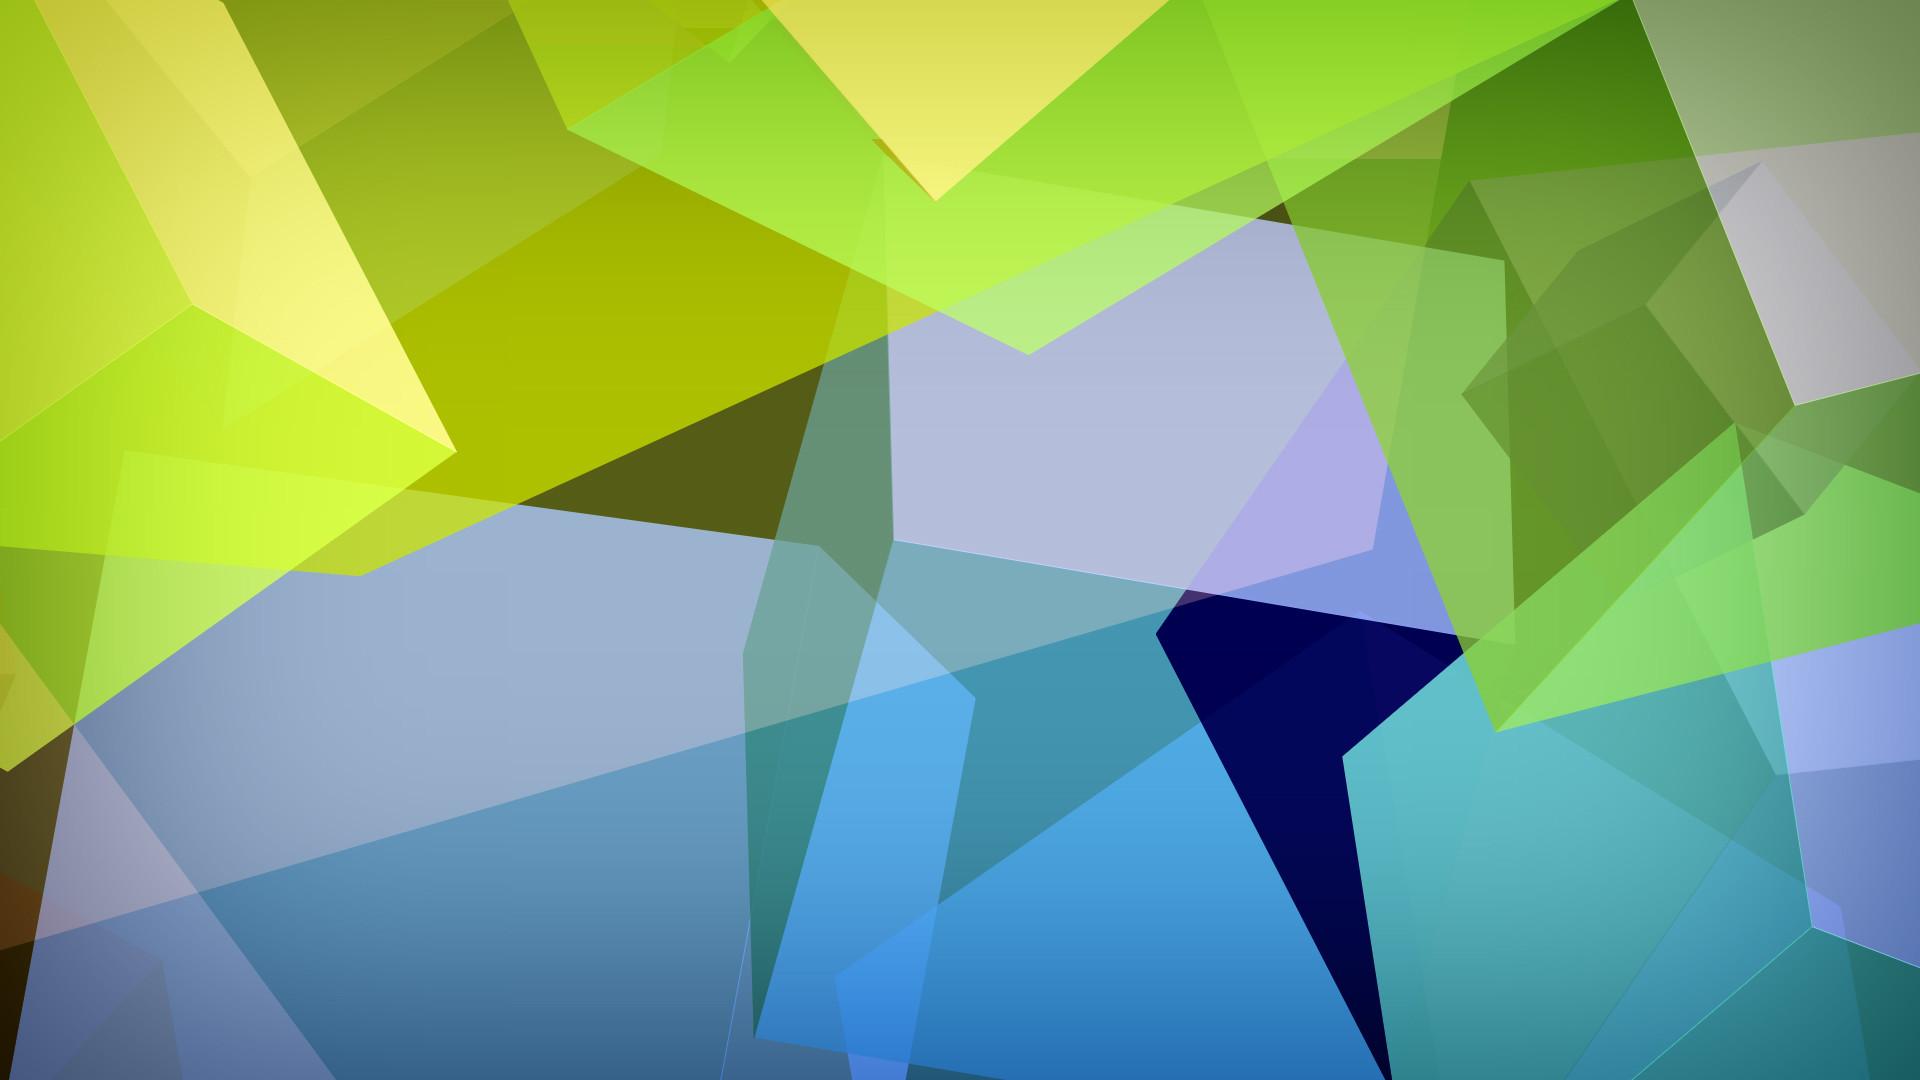 geometric shape wallpaper 2015 – Grasscloth Wallpaper